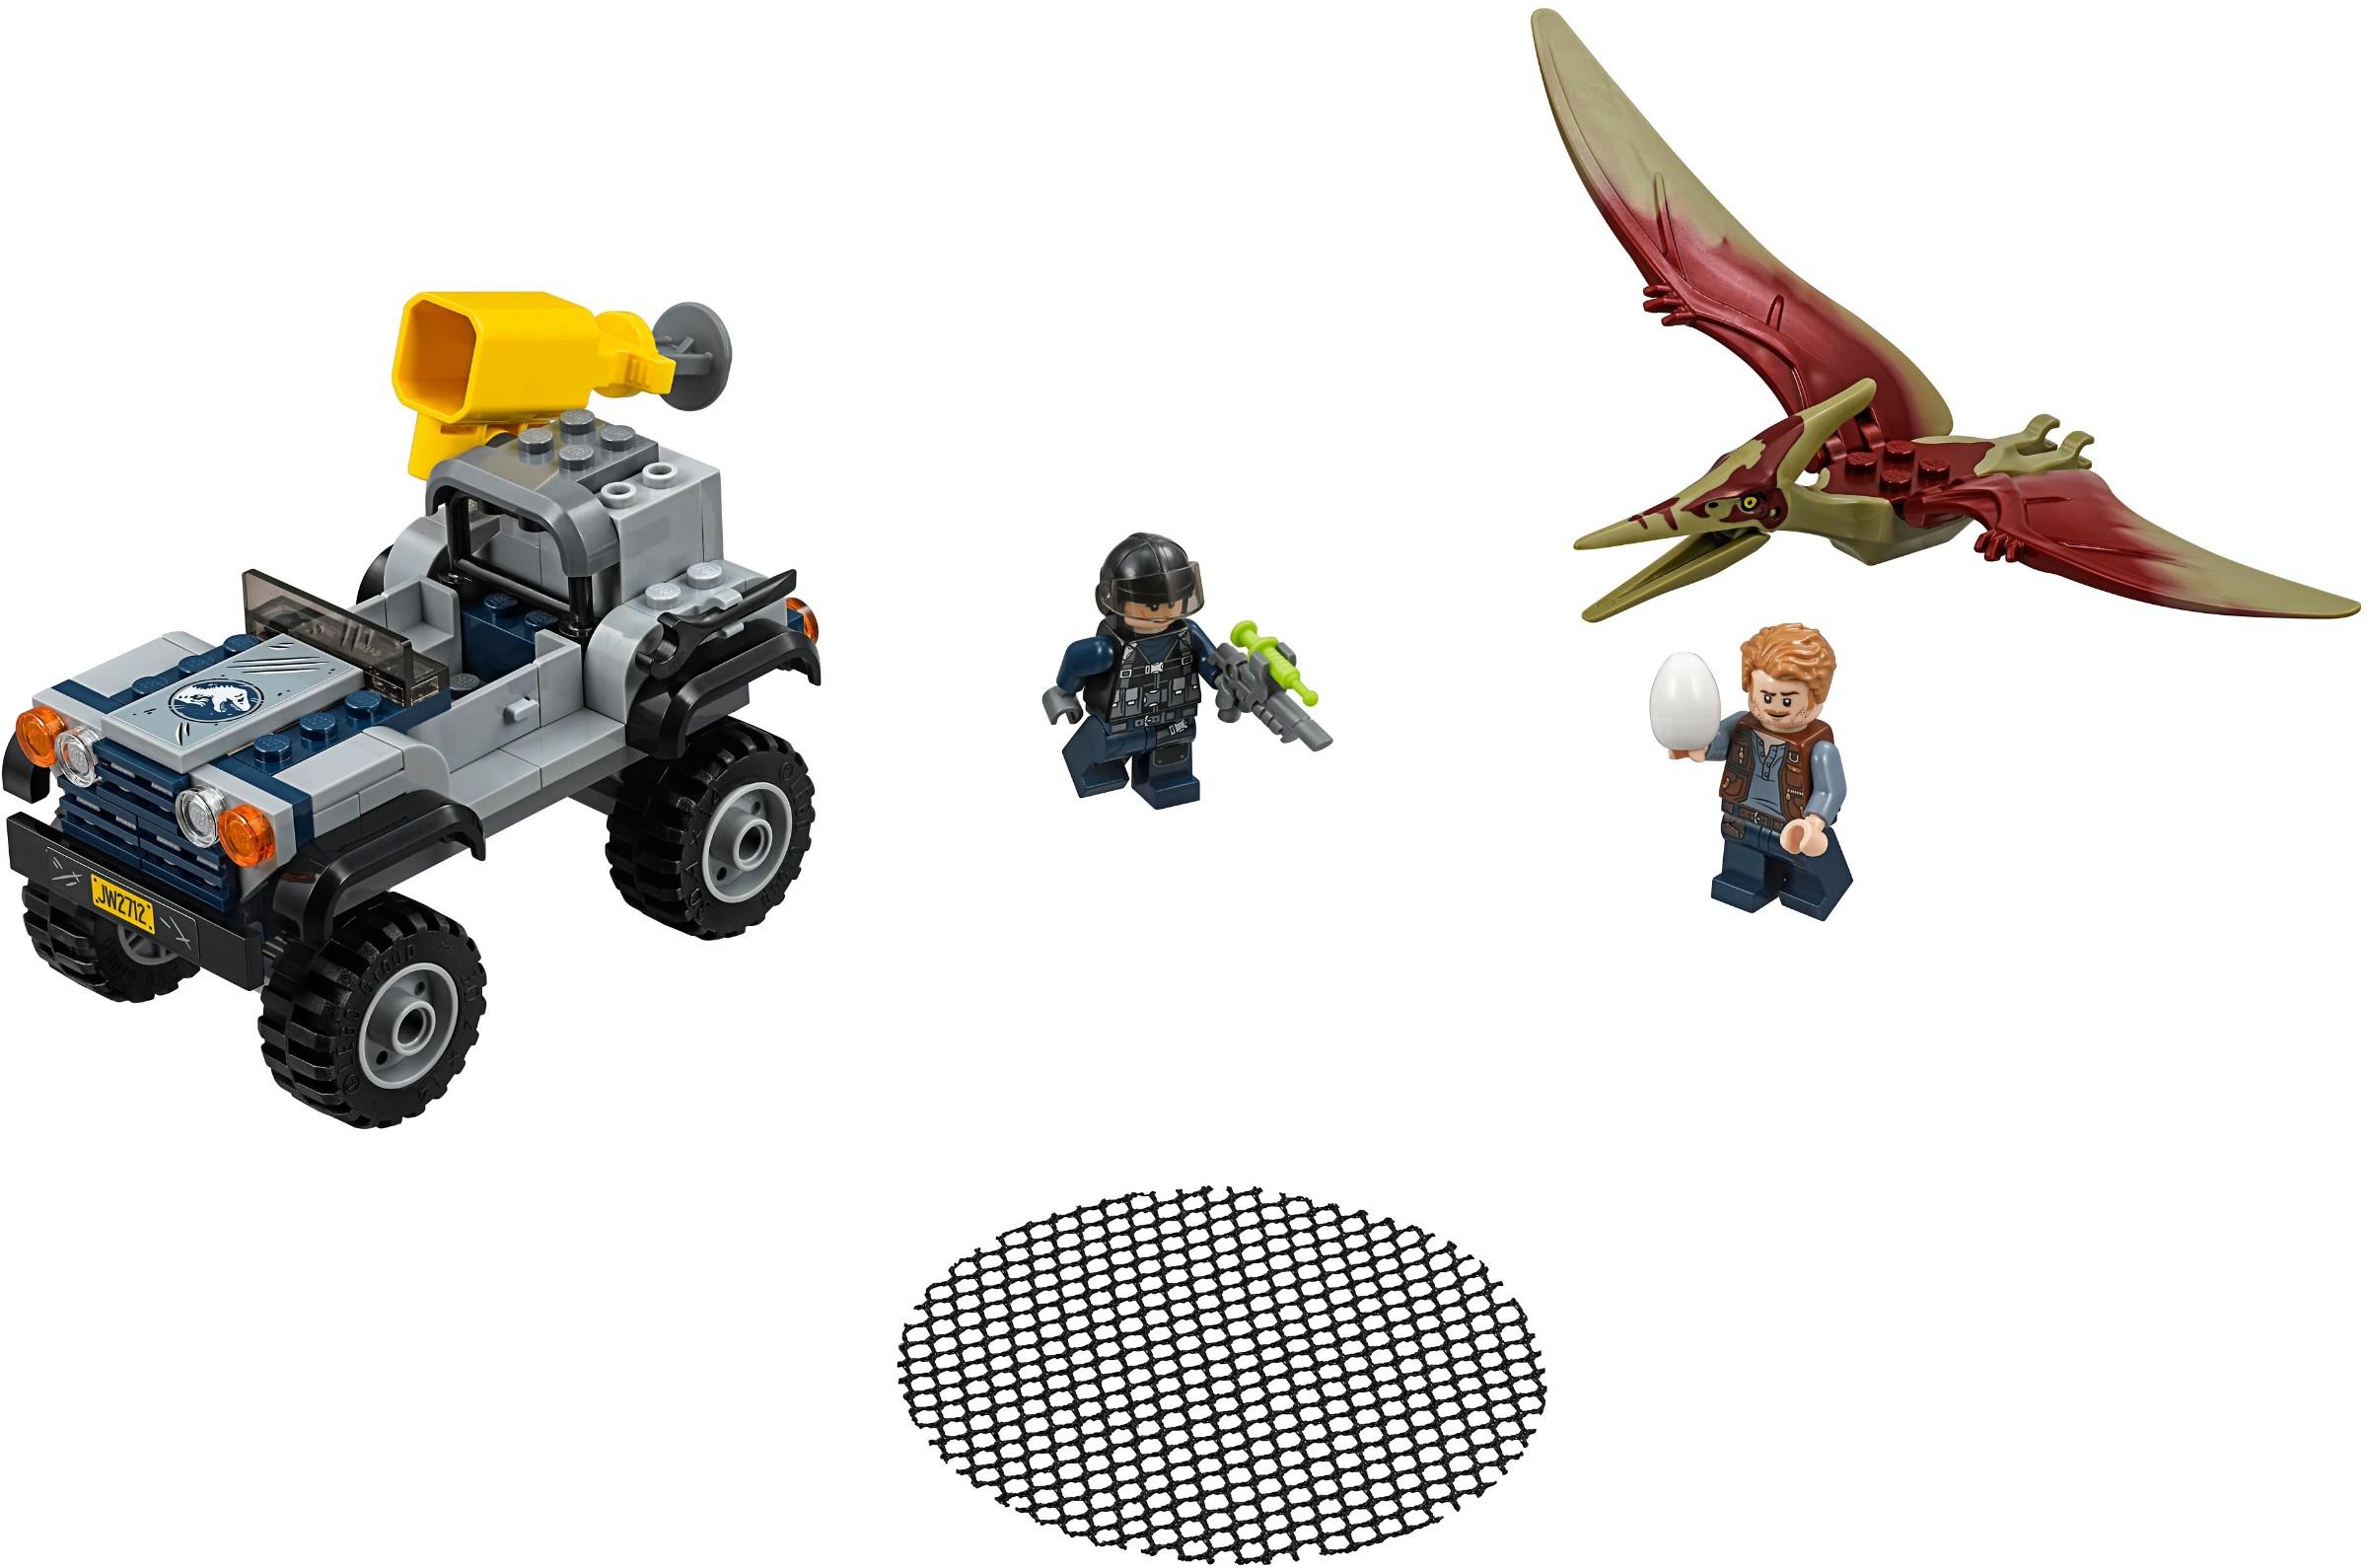 Set And Jurassic Database World2018 BricksetLego Guide ChQtsrdxB